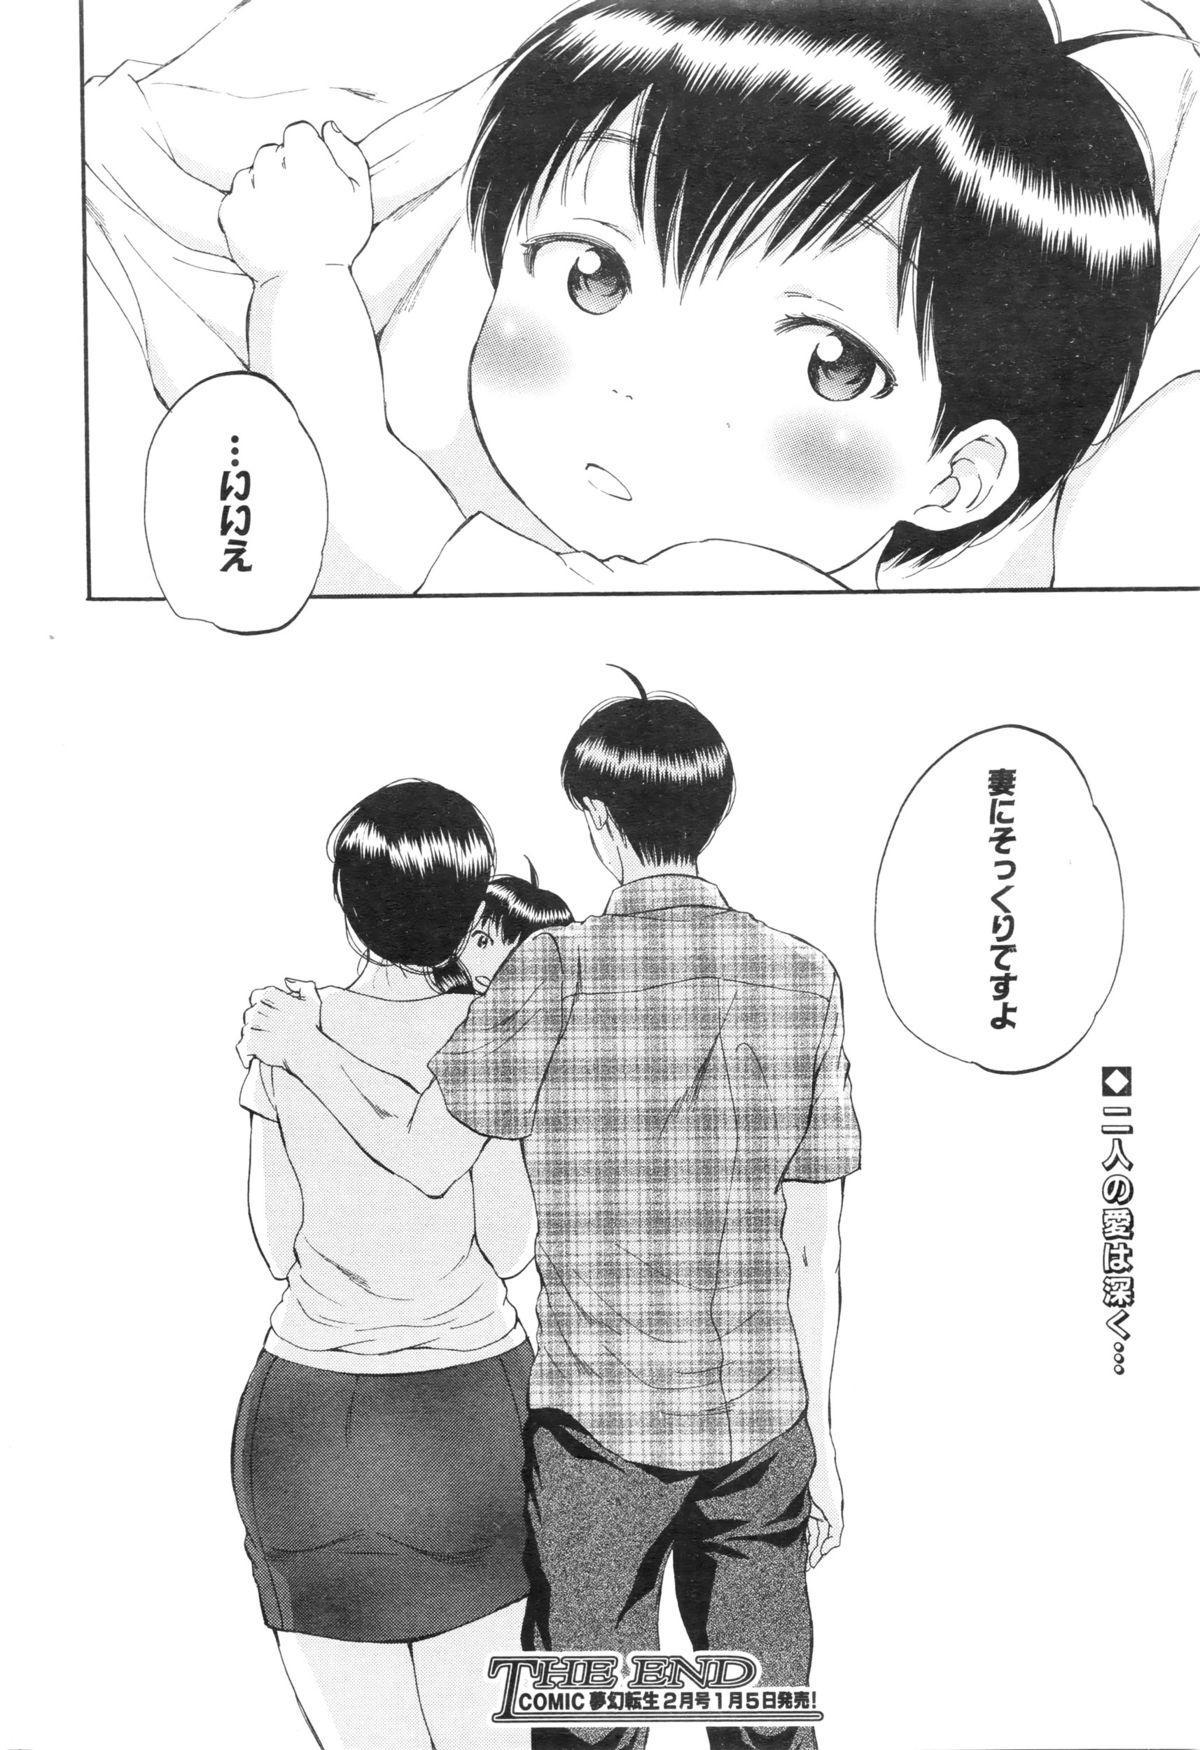 COMIC Mugen Tensei 2016-01 221